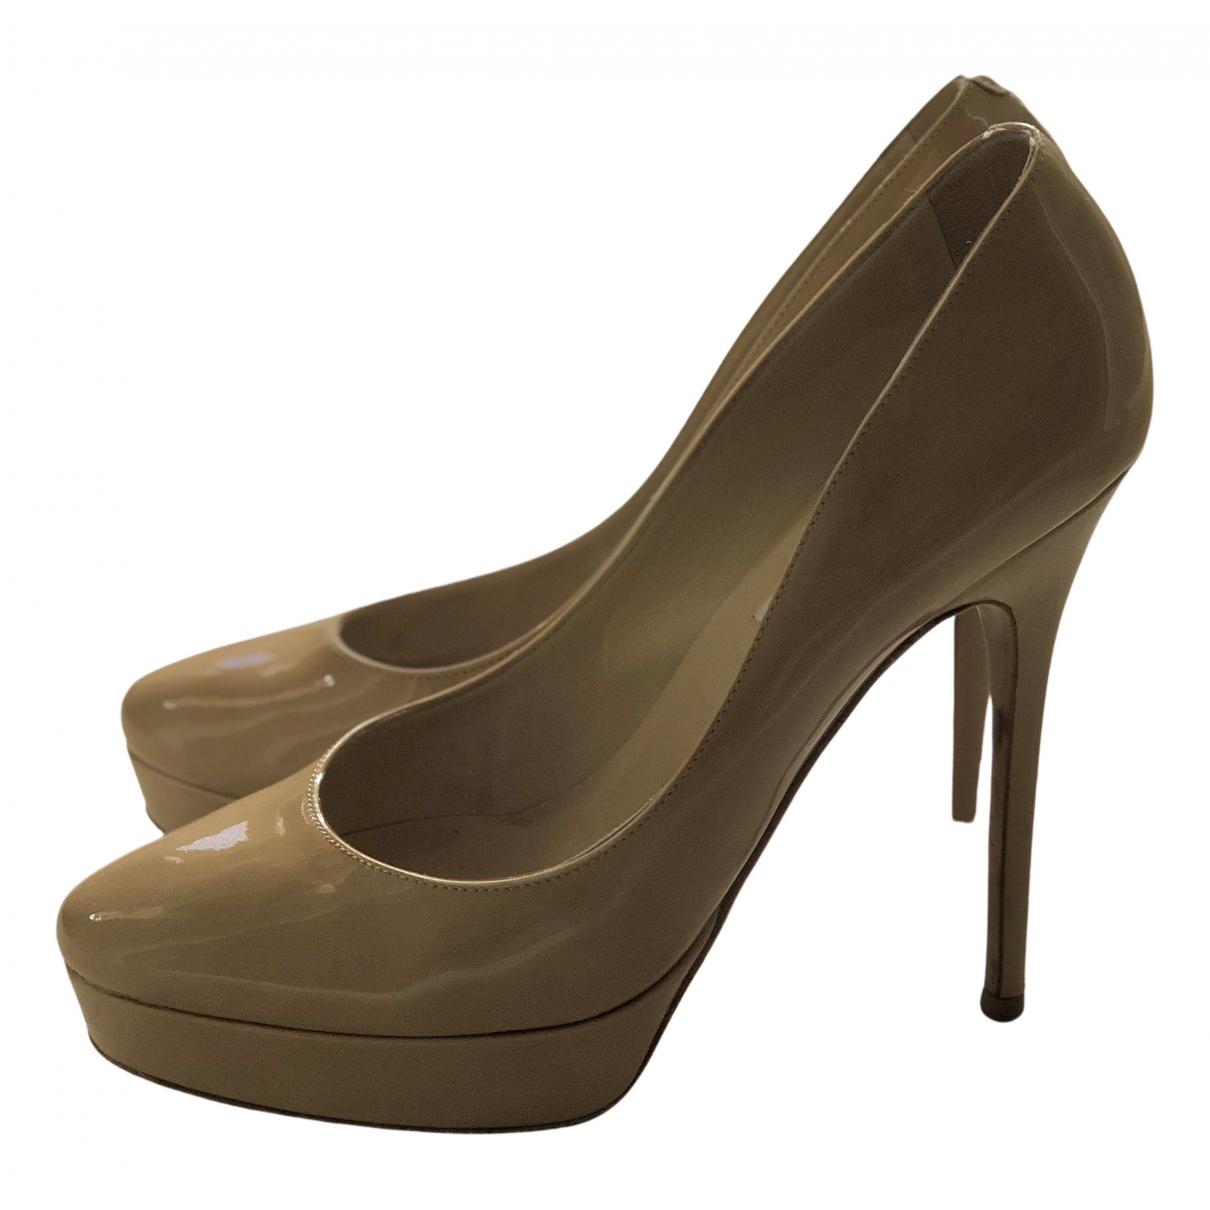 Jimmy Choo N Ecru Patent leather Heels for Women 38.5 EU